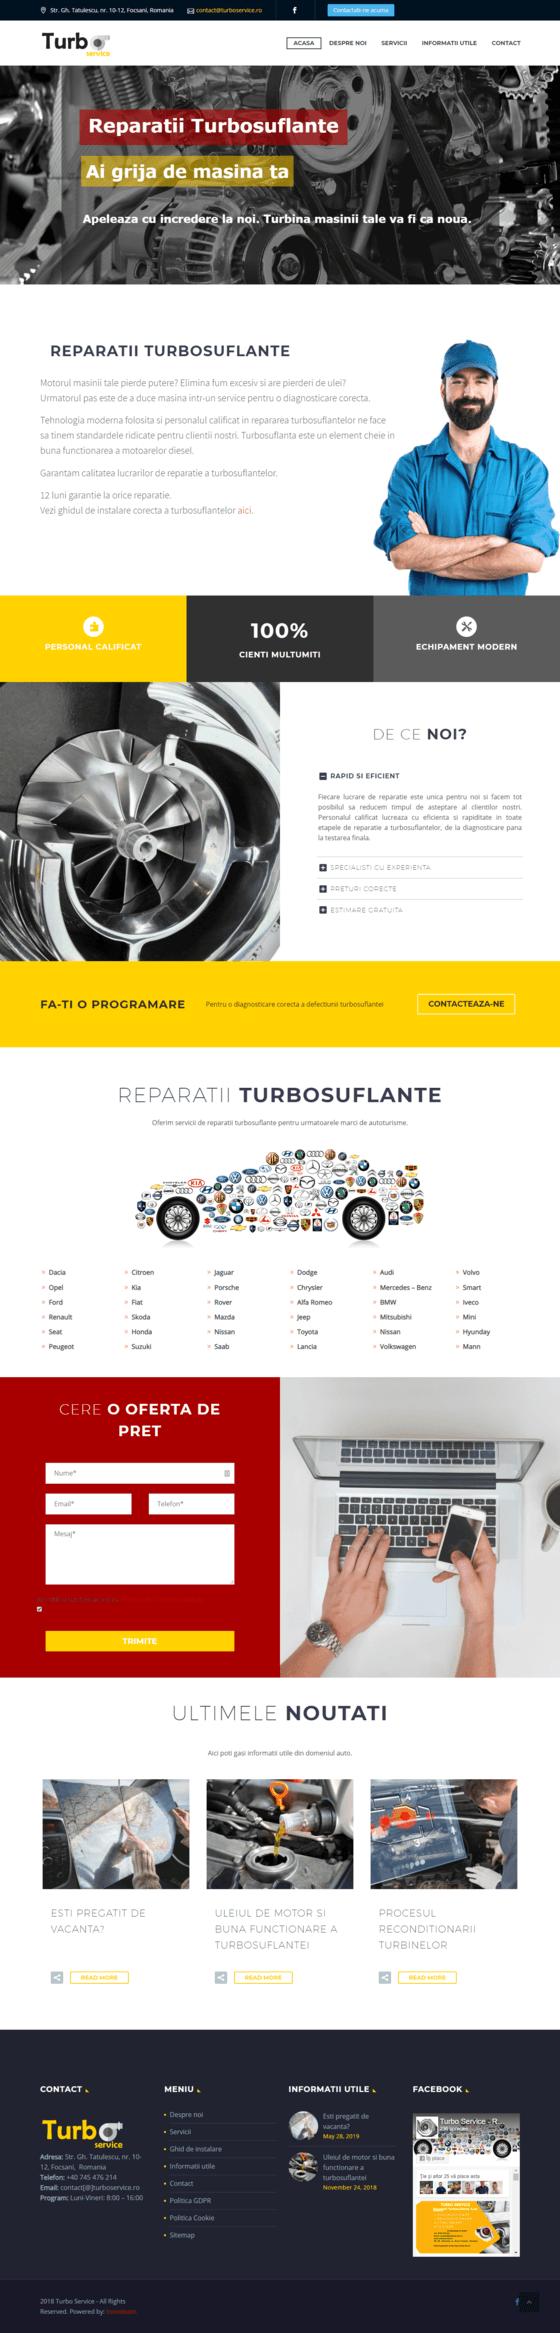 Inovateam site de prezentare- turboservice